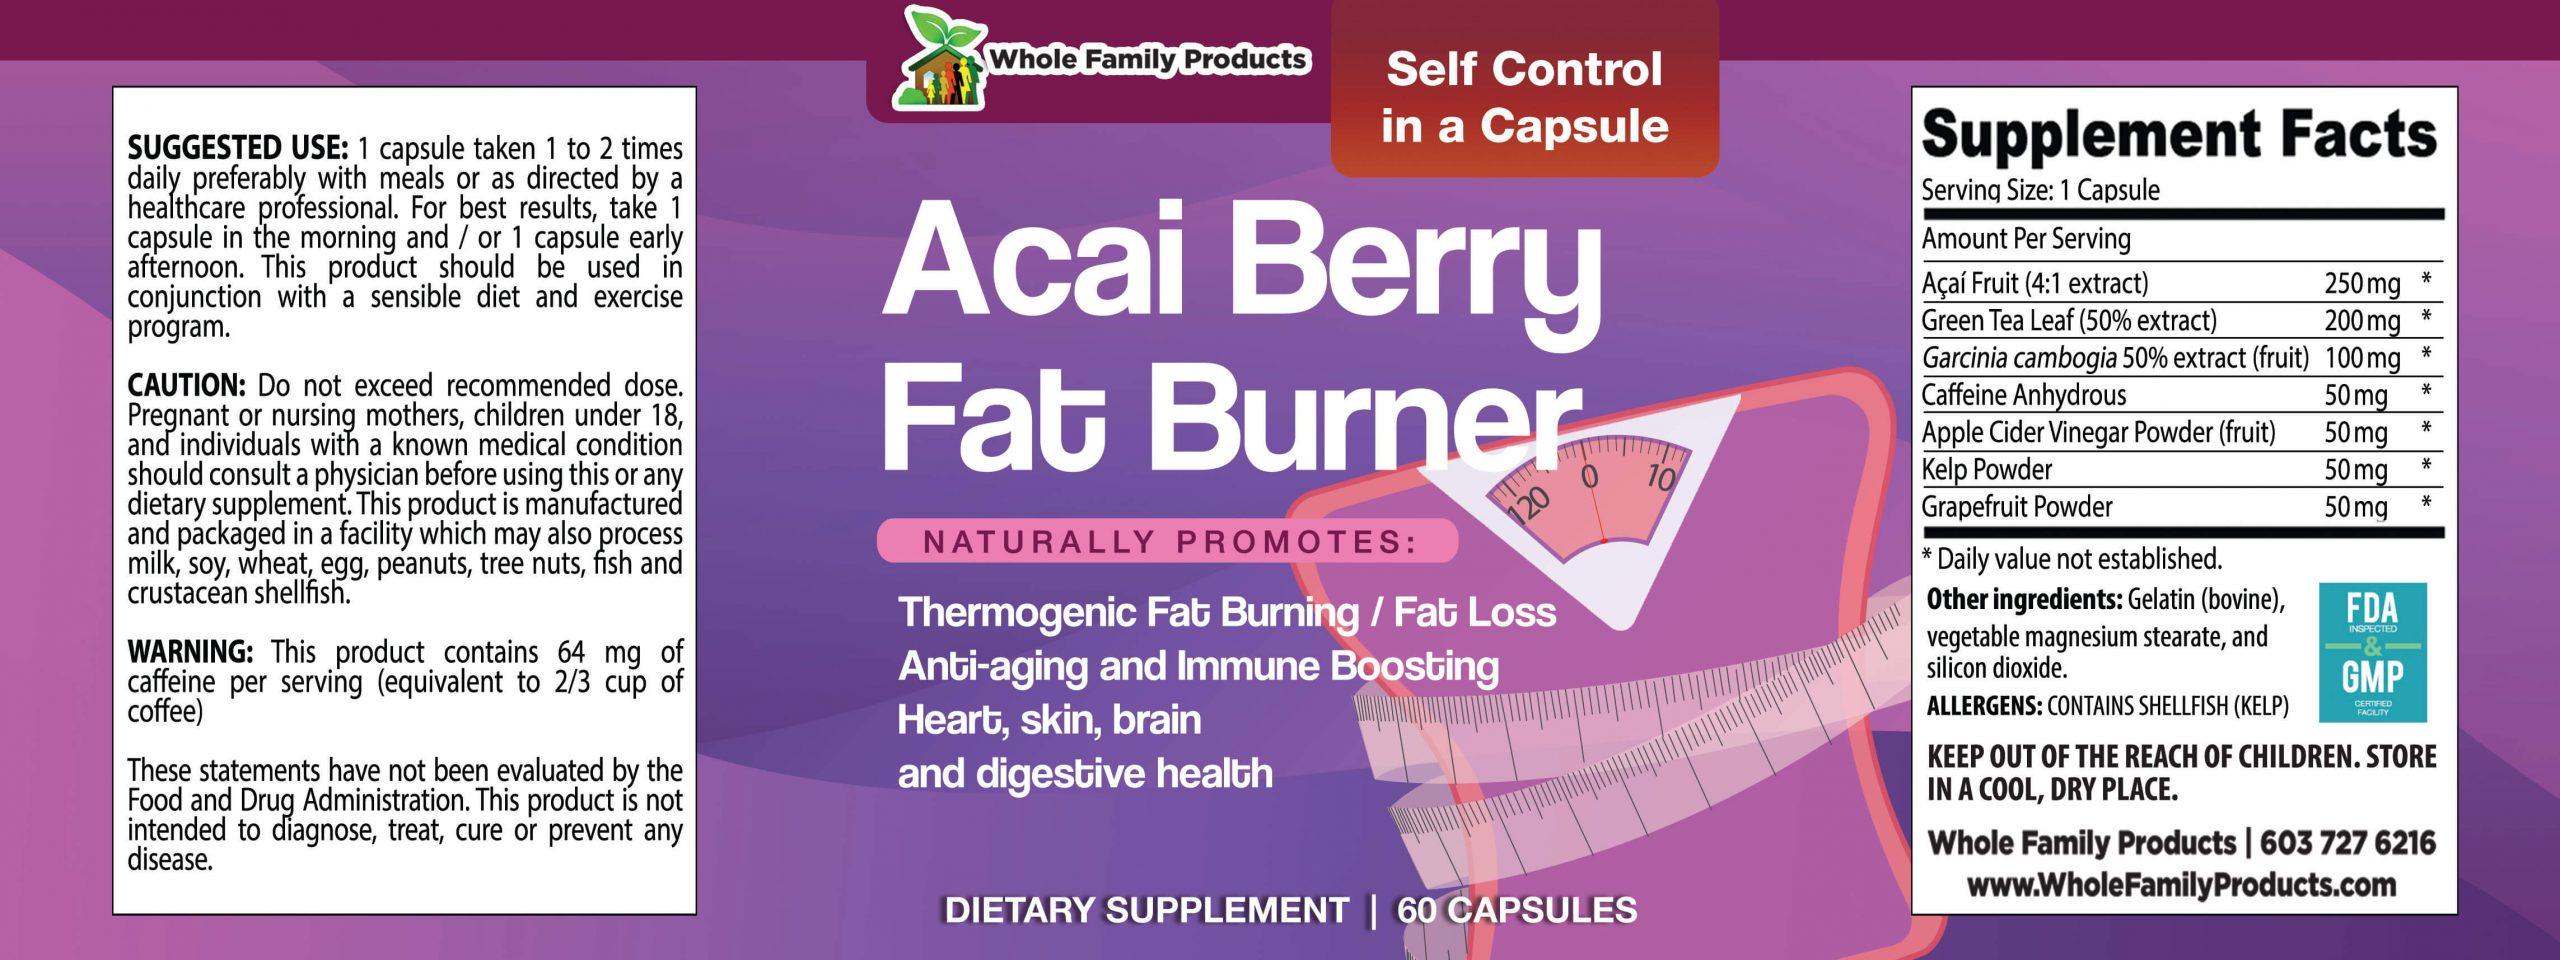 Acai Berry Fat Burner 60 Capsules WFP Product Label